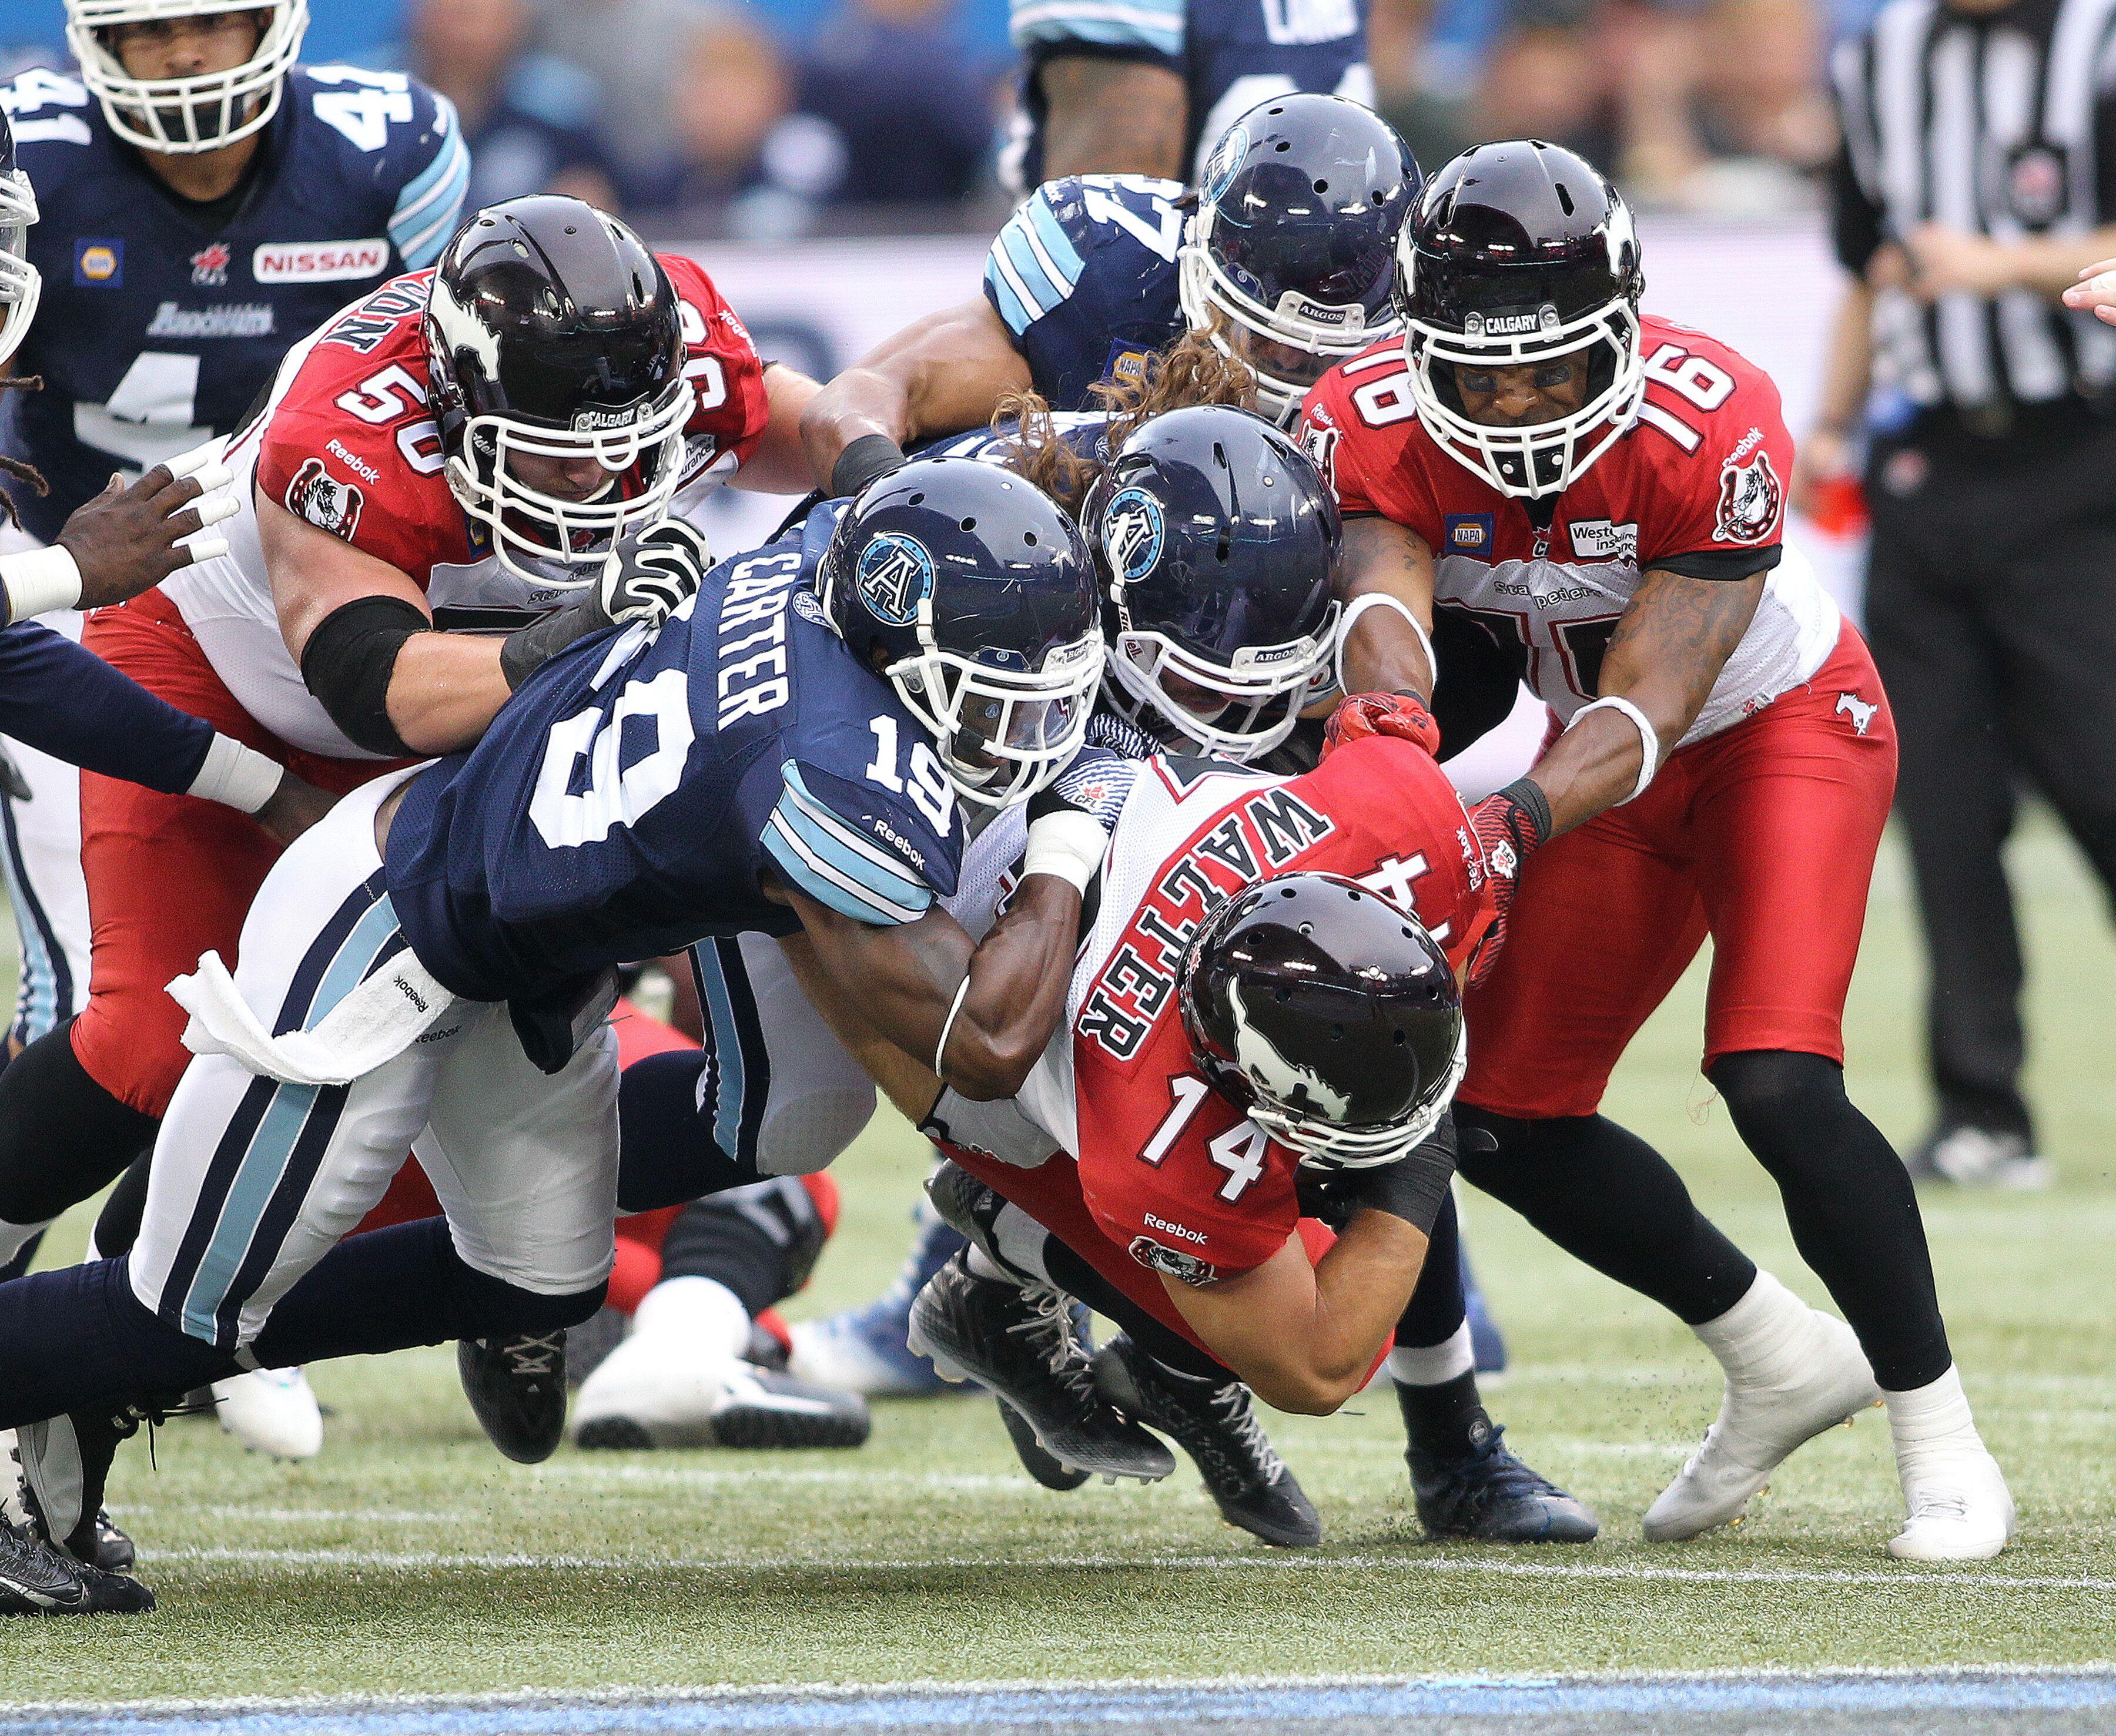 Toronto Argonauts looking to keep momentum going against Stampeders